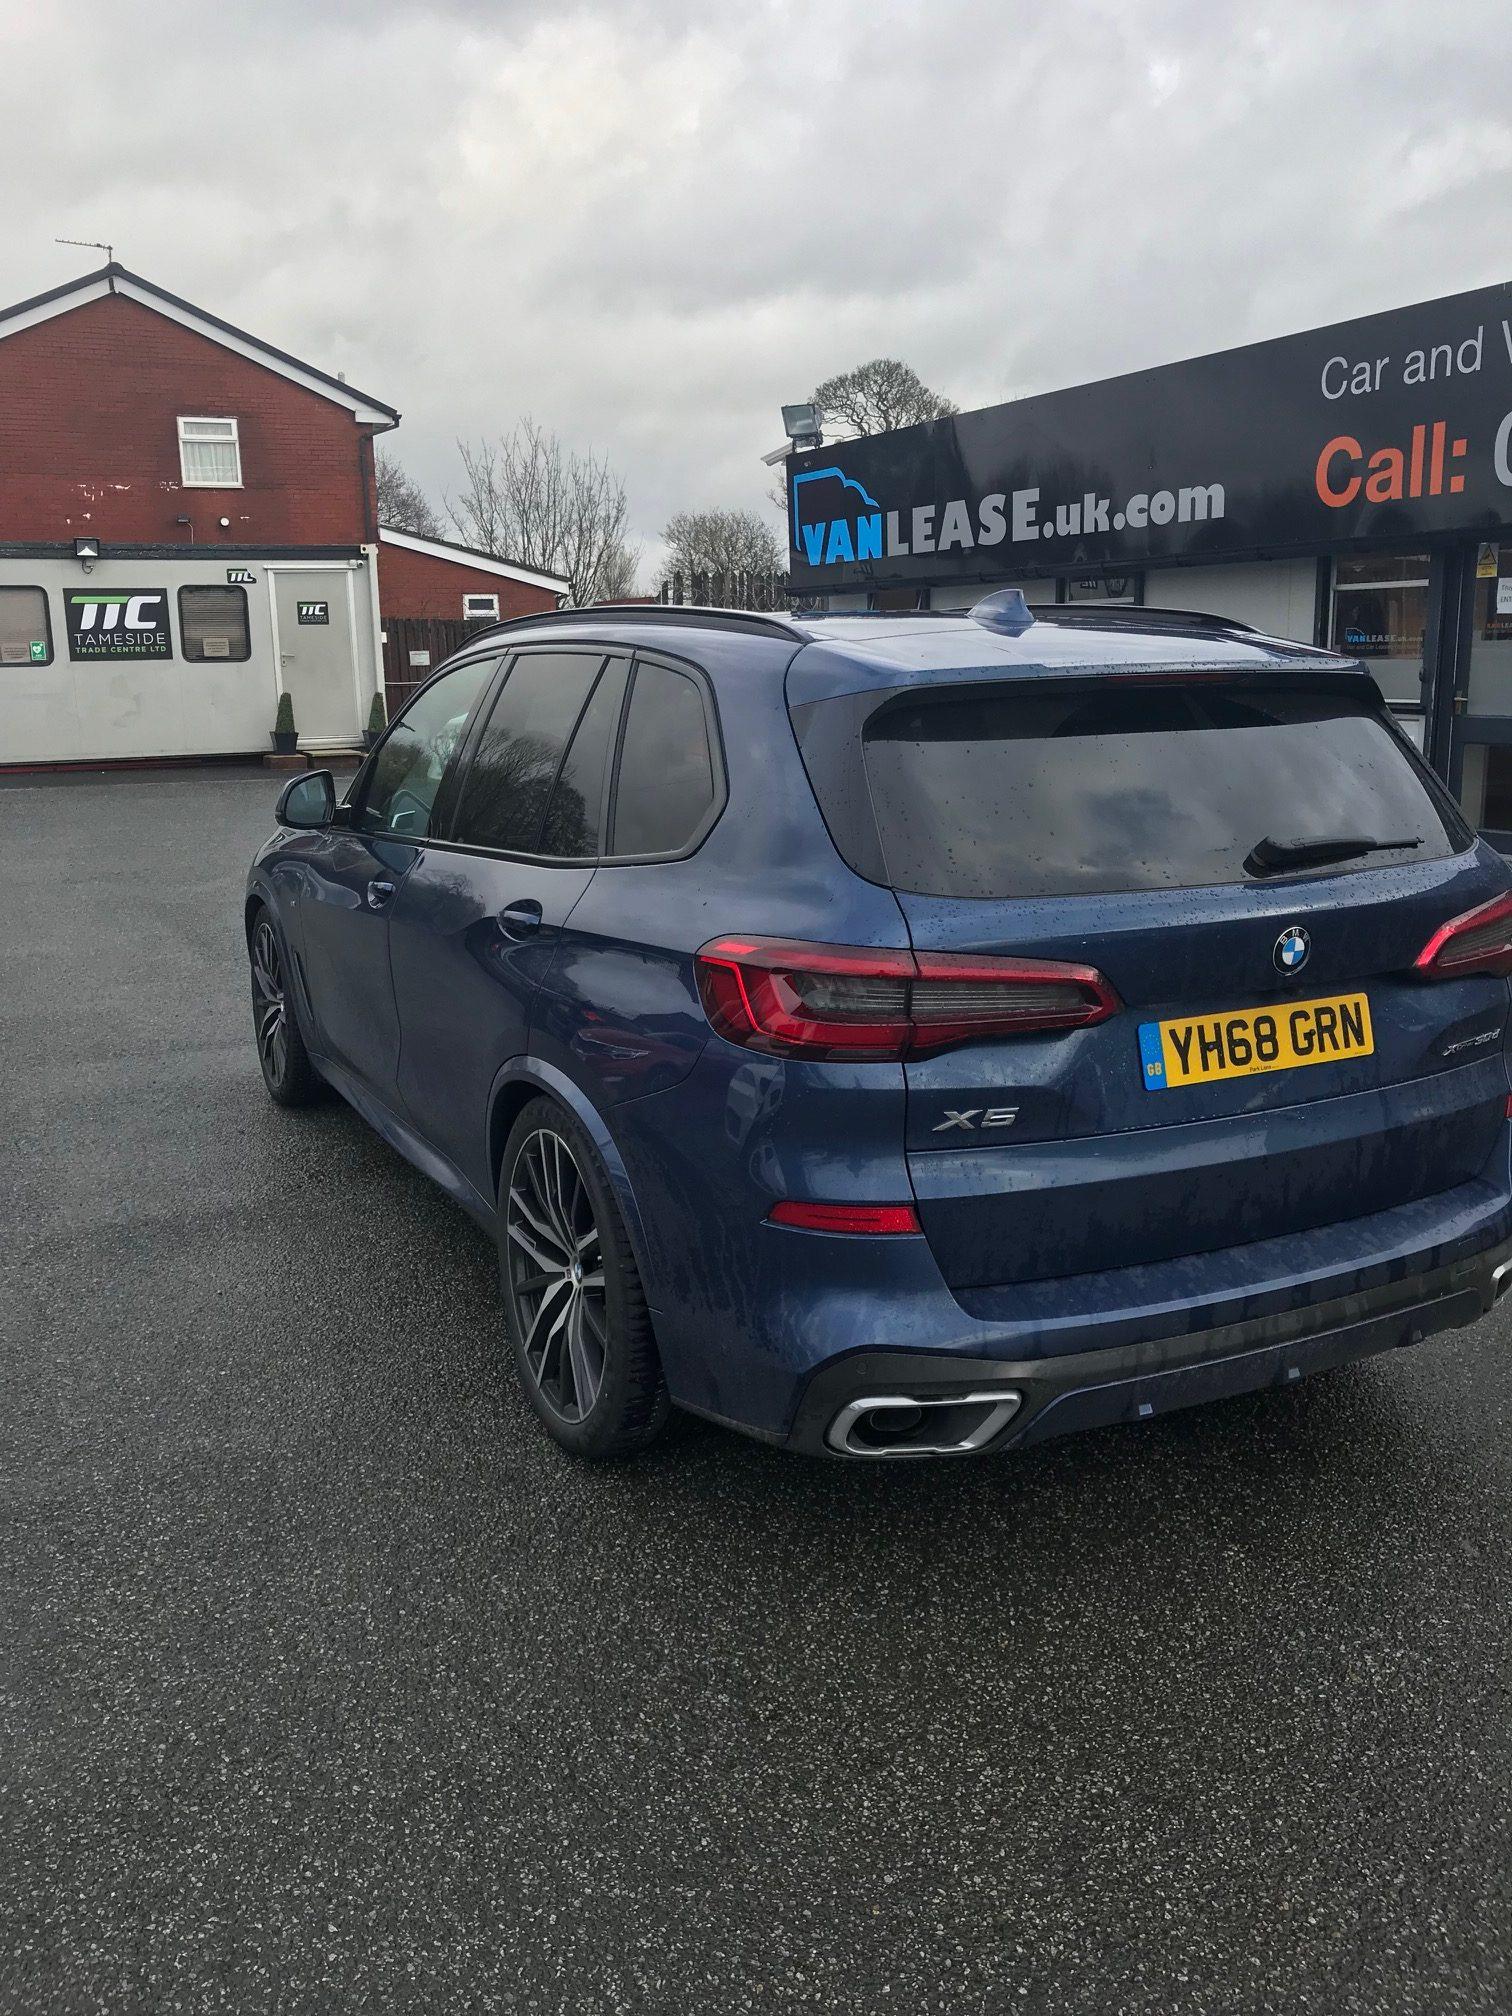 BMW X5 DIESEL ESTATE xDrive30d M Sport 5dr Auto Car Leasing Select Options